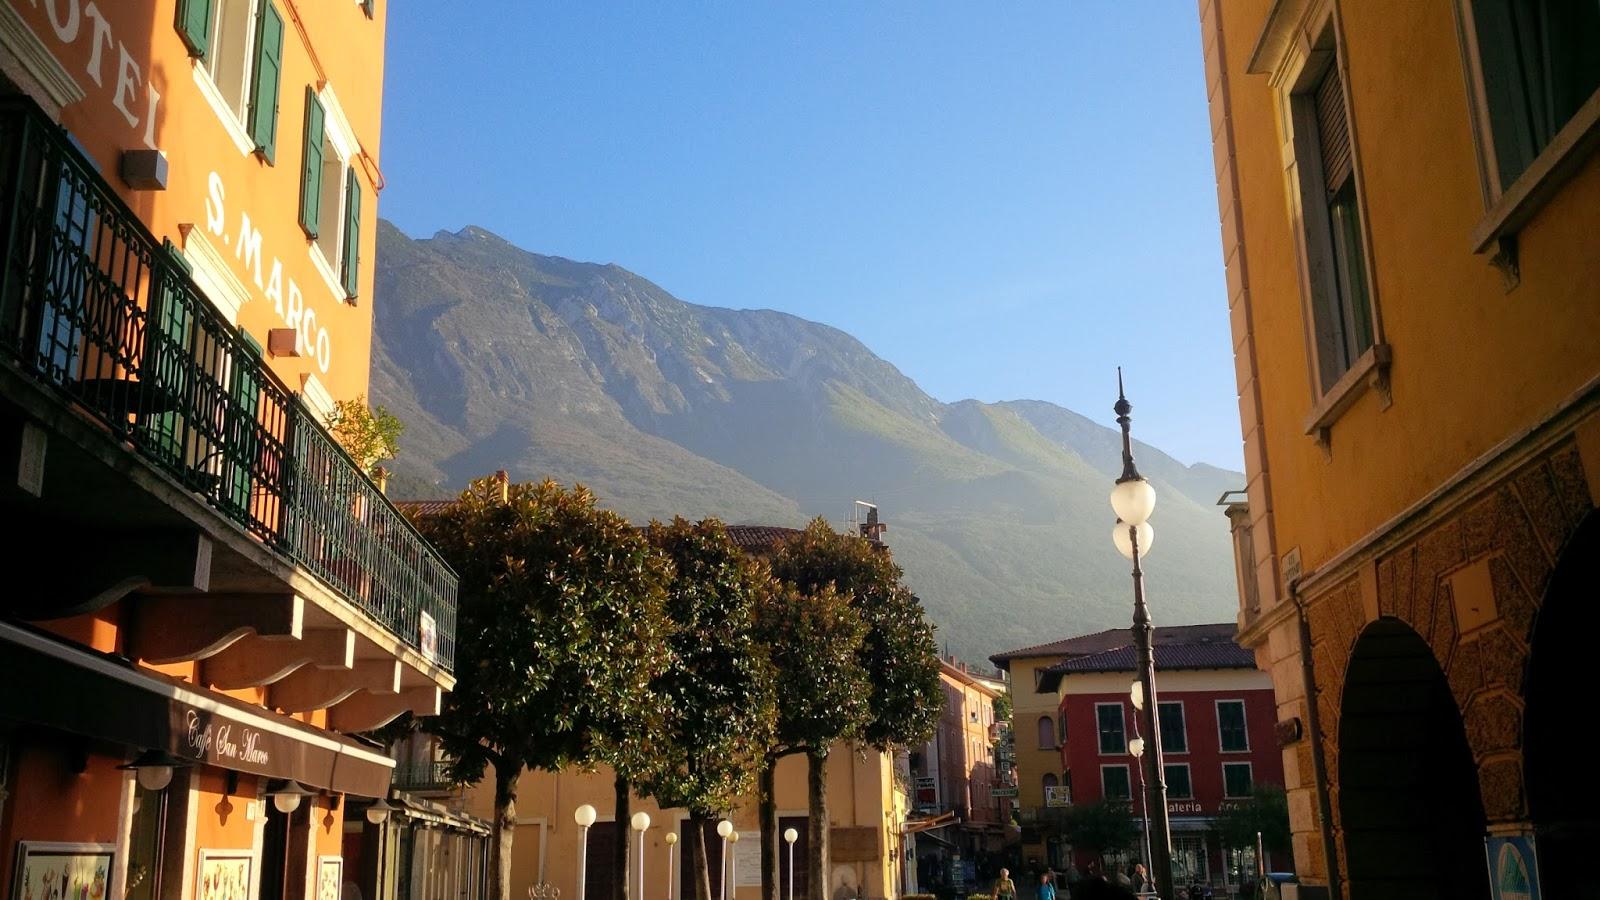 Malcesine with Mount Baldo as its backdrop, Veneto, Italy